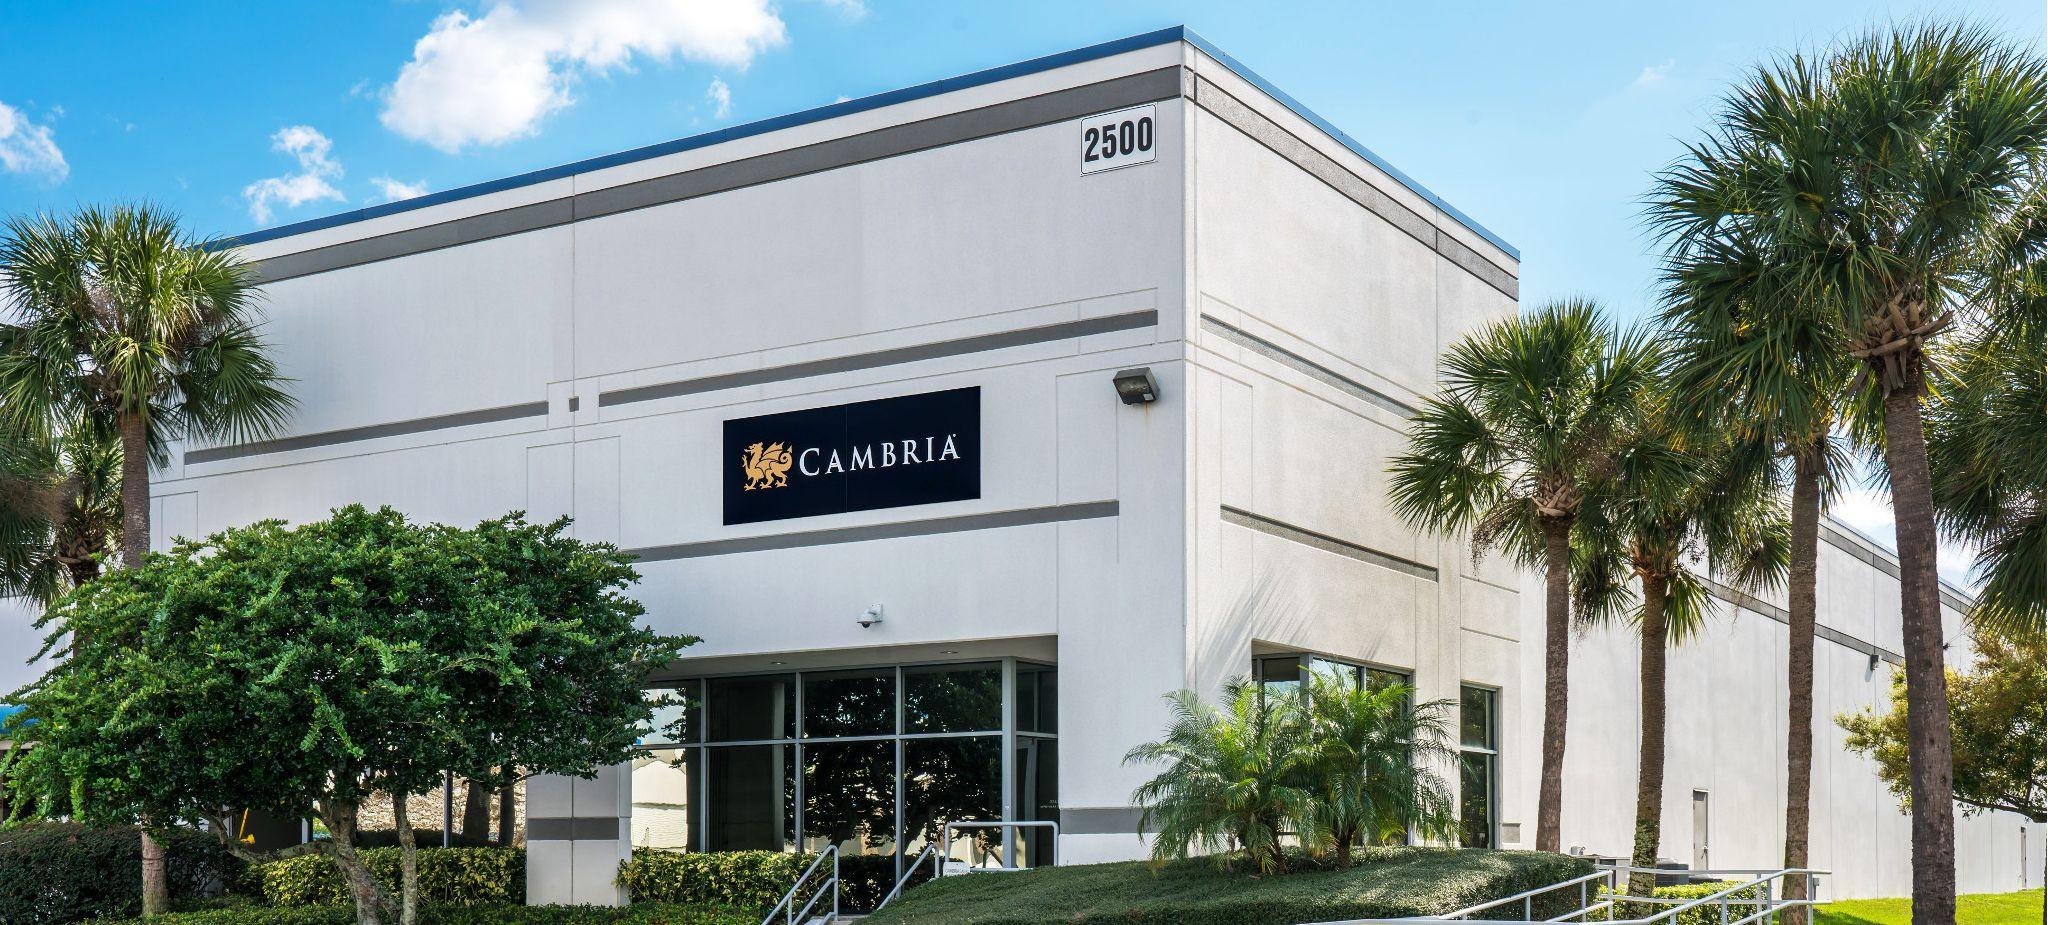 Cambria DC_Orlando_Ward_001_19.jpg